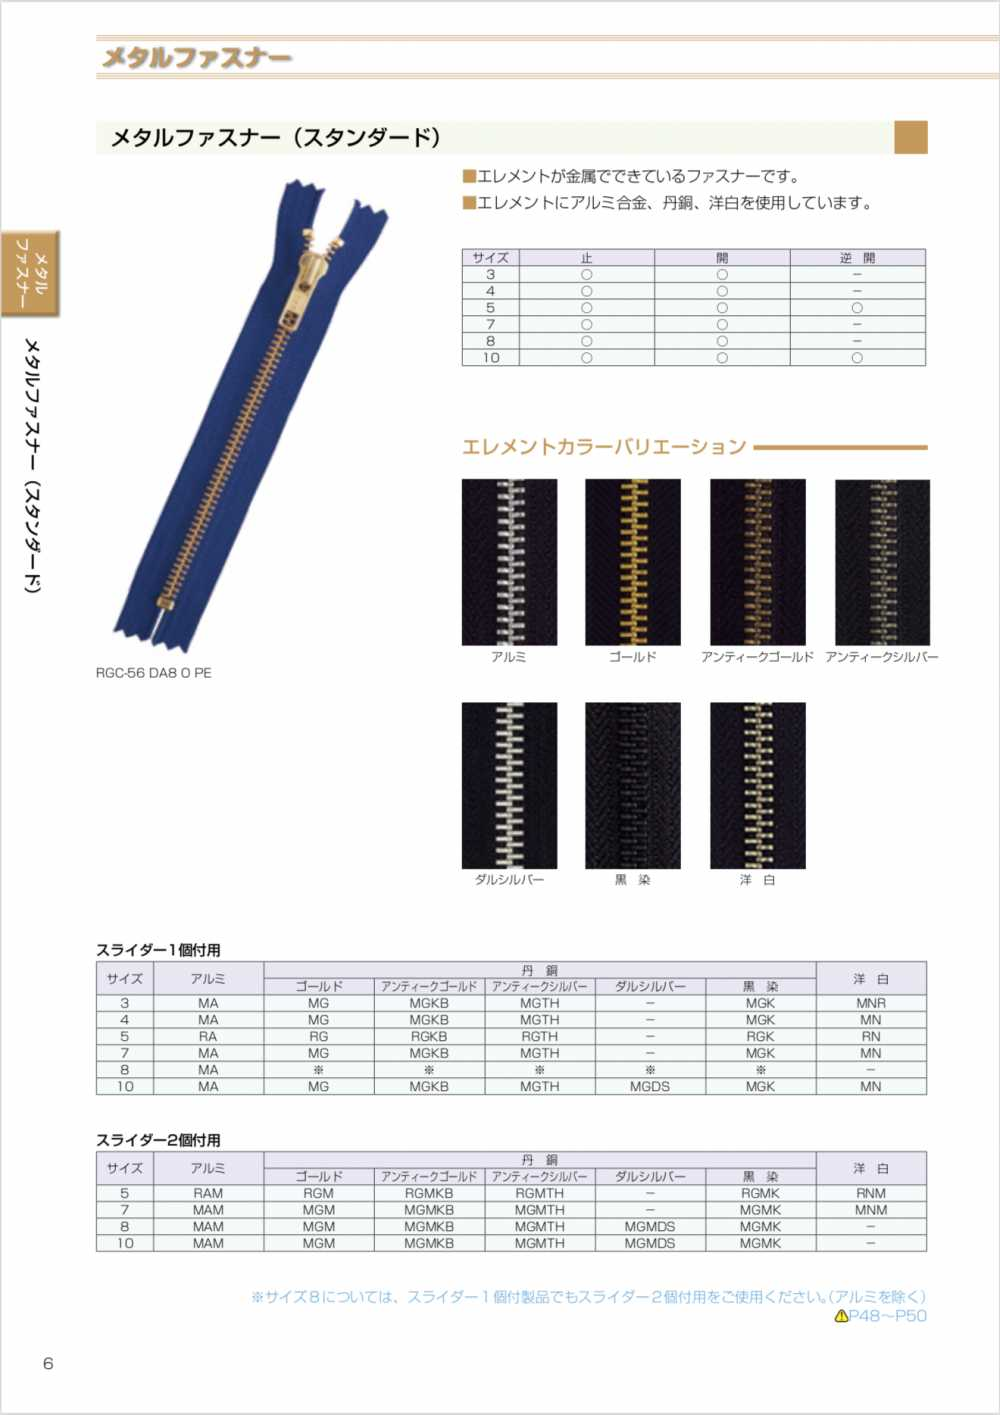 10MGKBOR YKKメタルファスナー 10サイズ アンティークゴールド オープン YKK/オークラ商事 - ApparelX アパレル資材卸通販